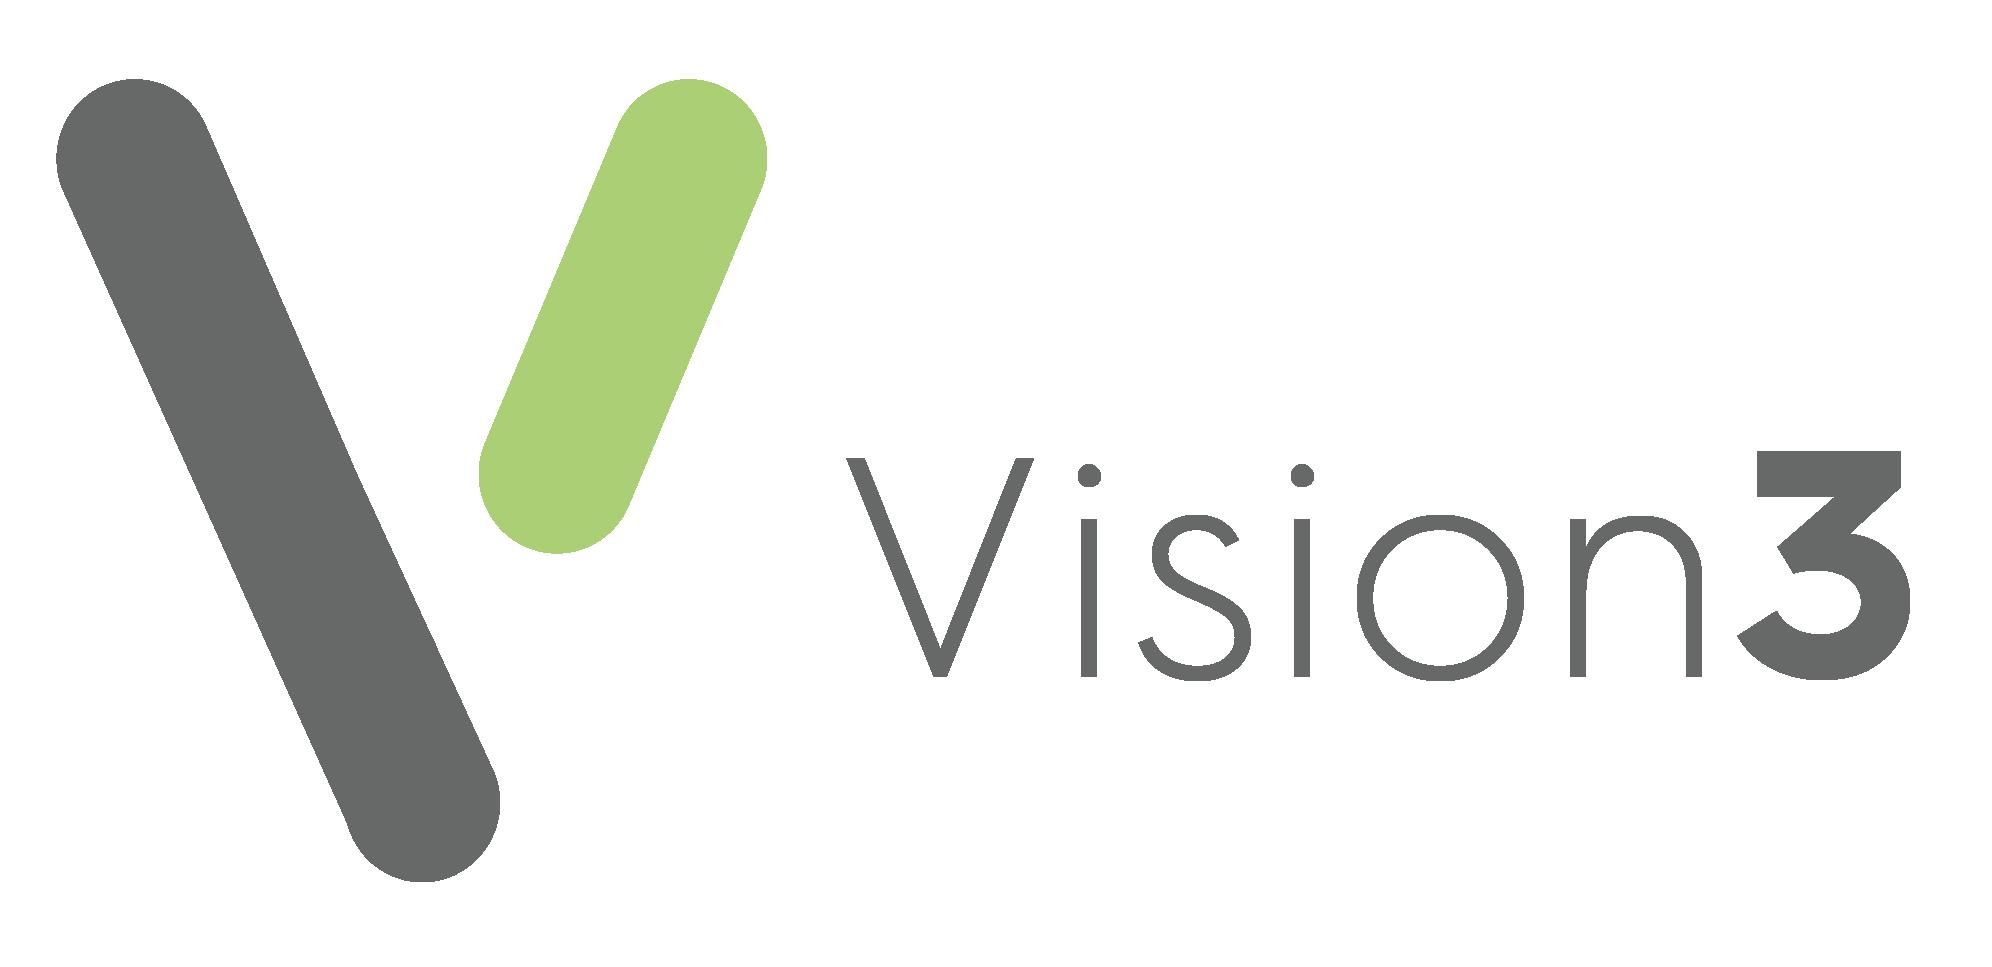 CHS_-Vision 3 logo